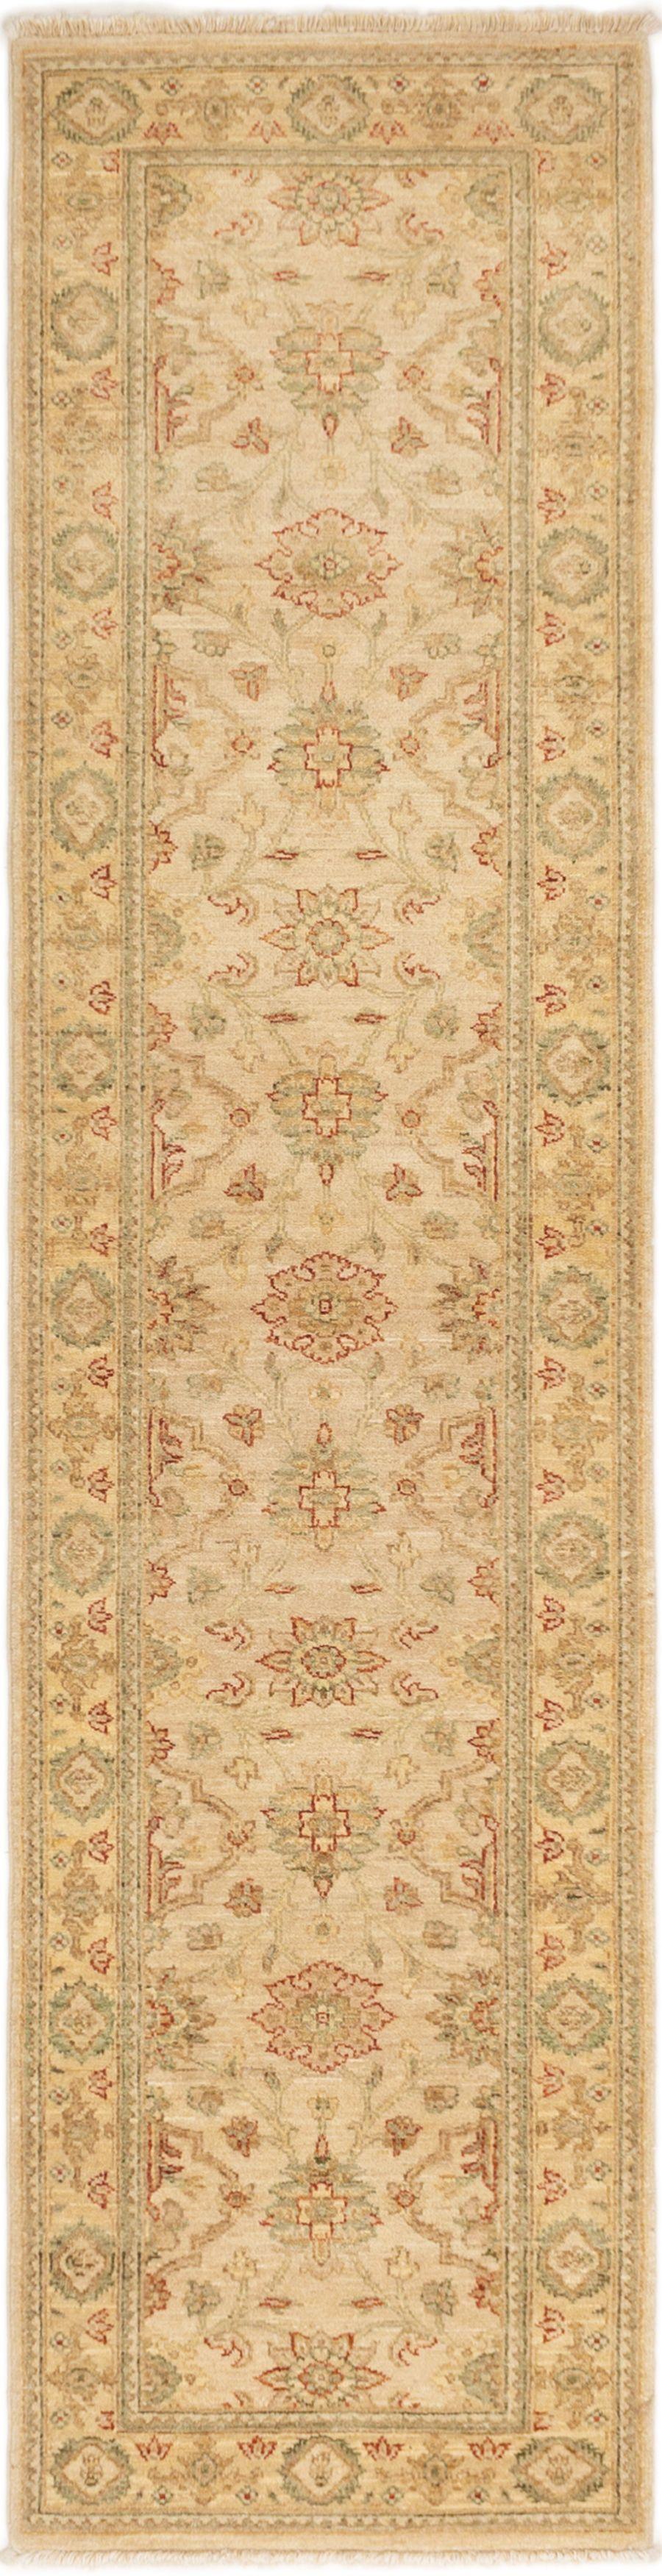 "Hand-knotted Peshawar Finest Beige Wool Rug 2'7"" x 10'1"" Size: 2'7"" x 10'1"""